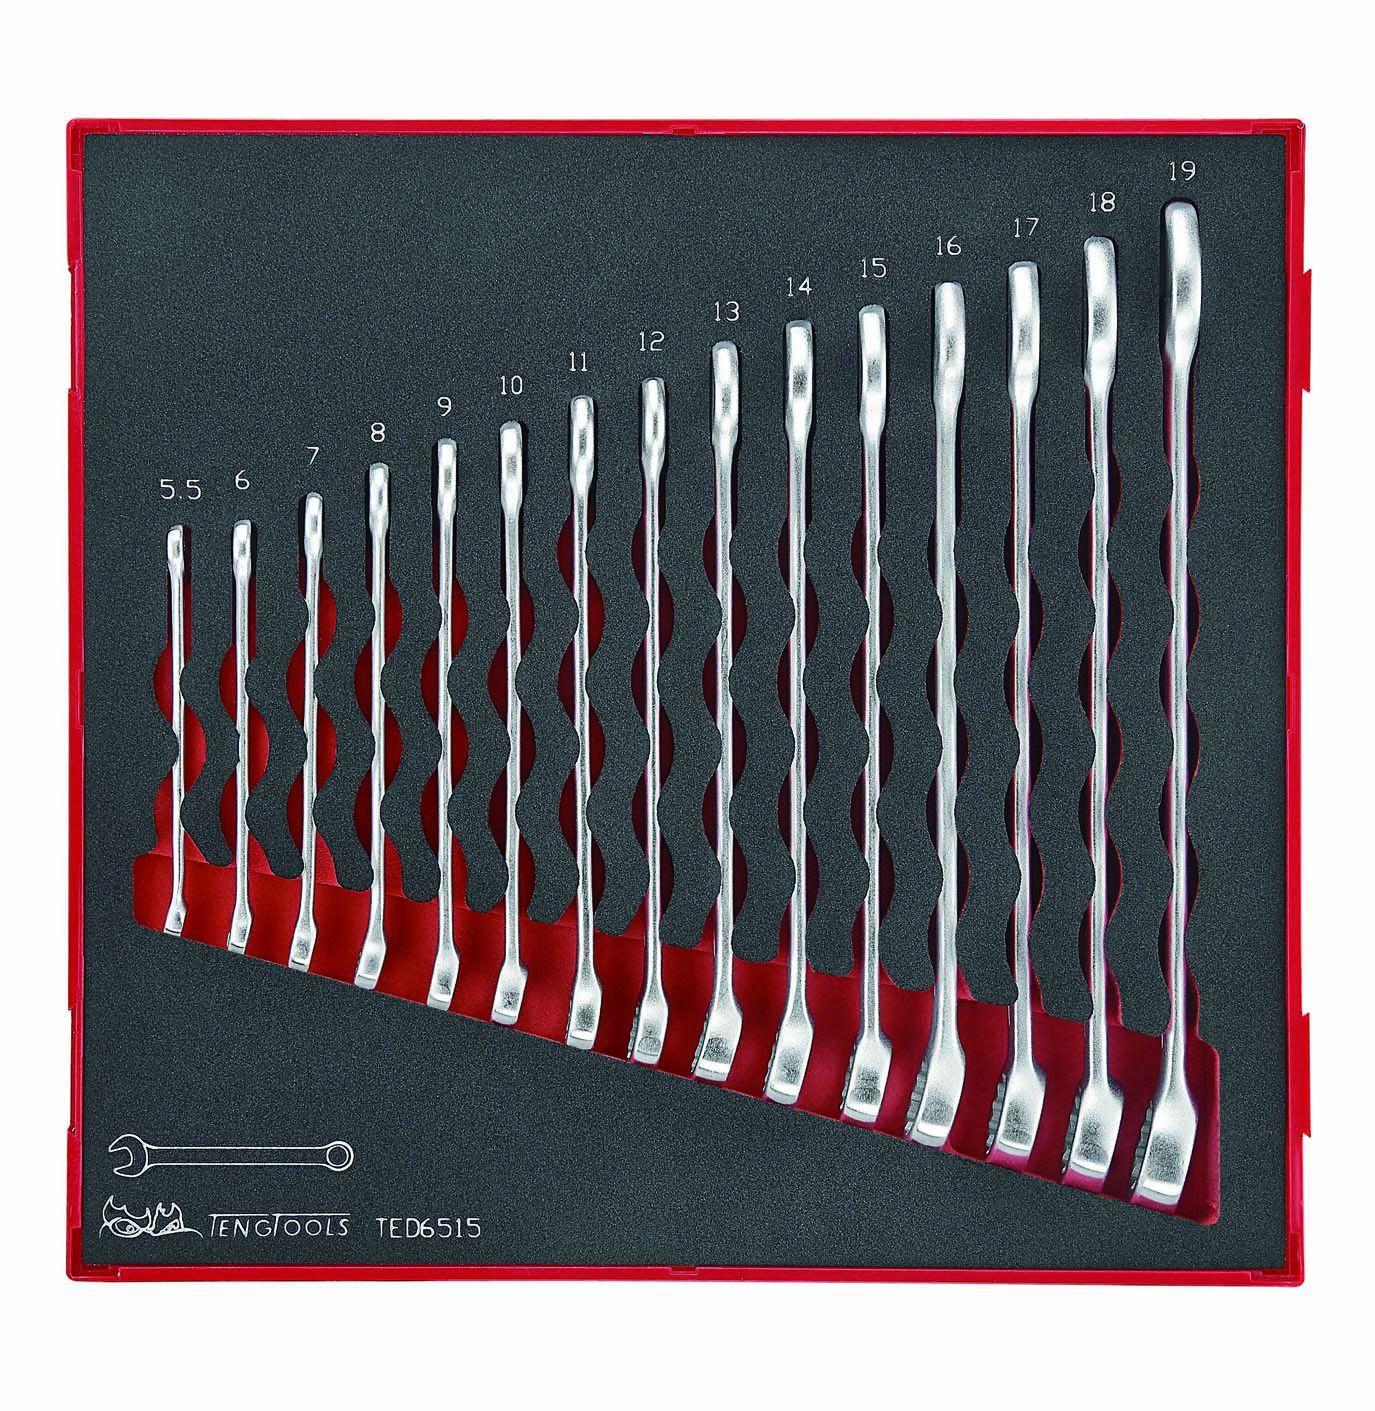 Teng Tools 15 Piece Metric Combination Spanner Set